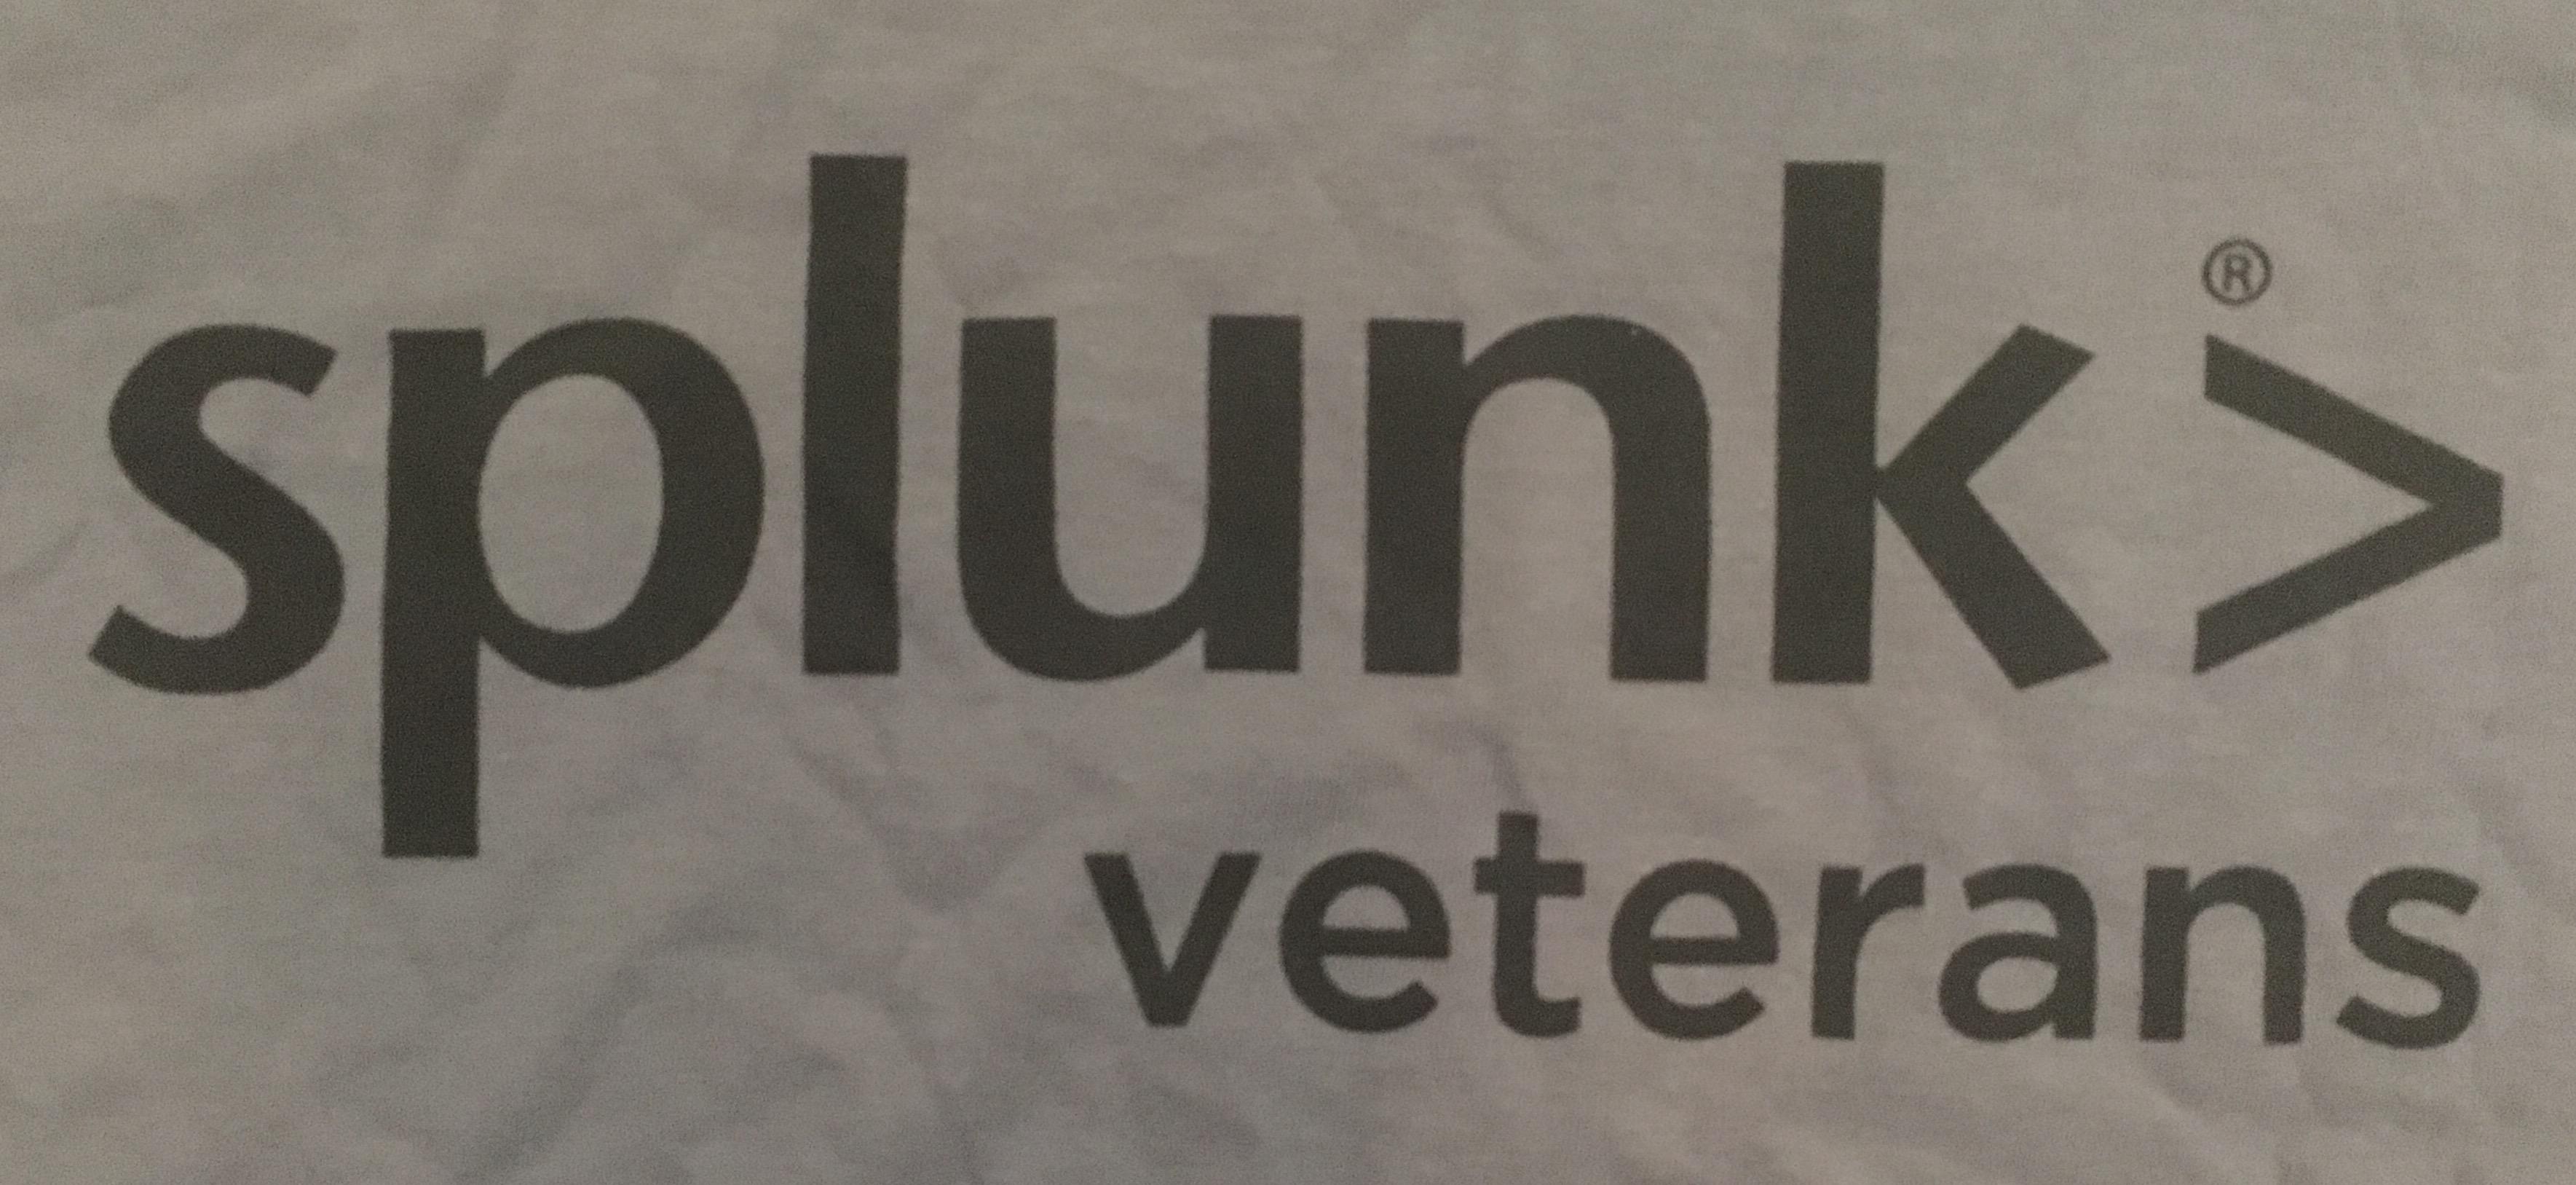 Splunk> Veterans